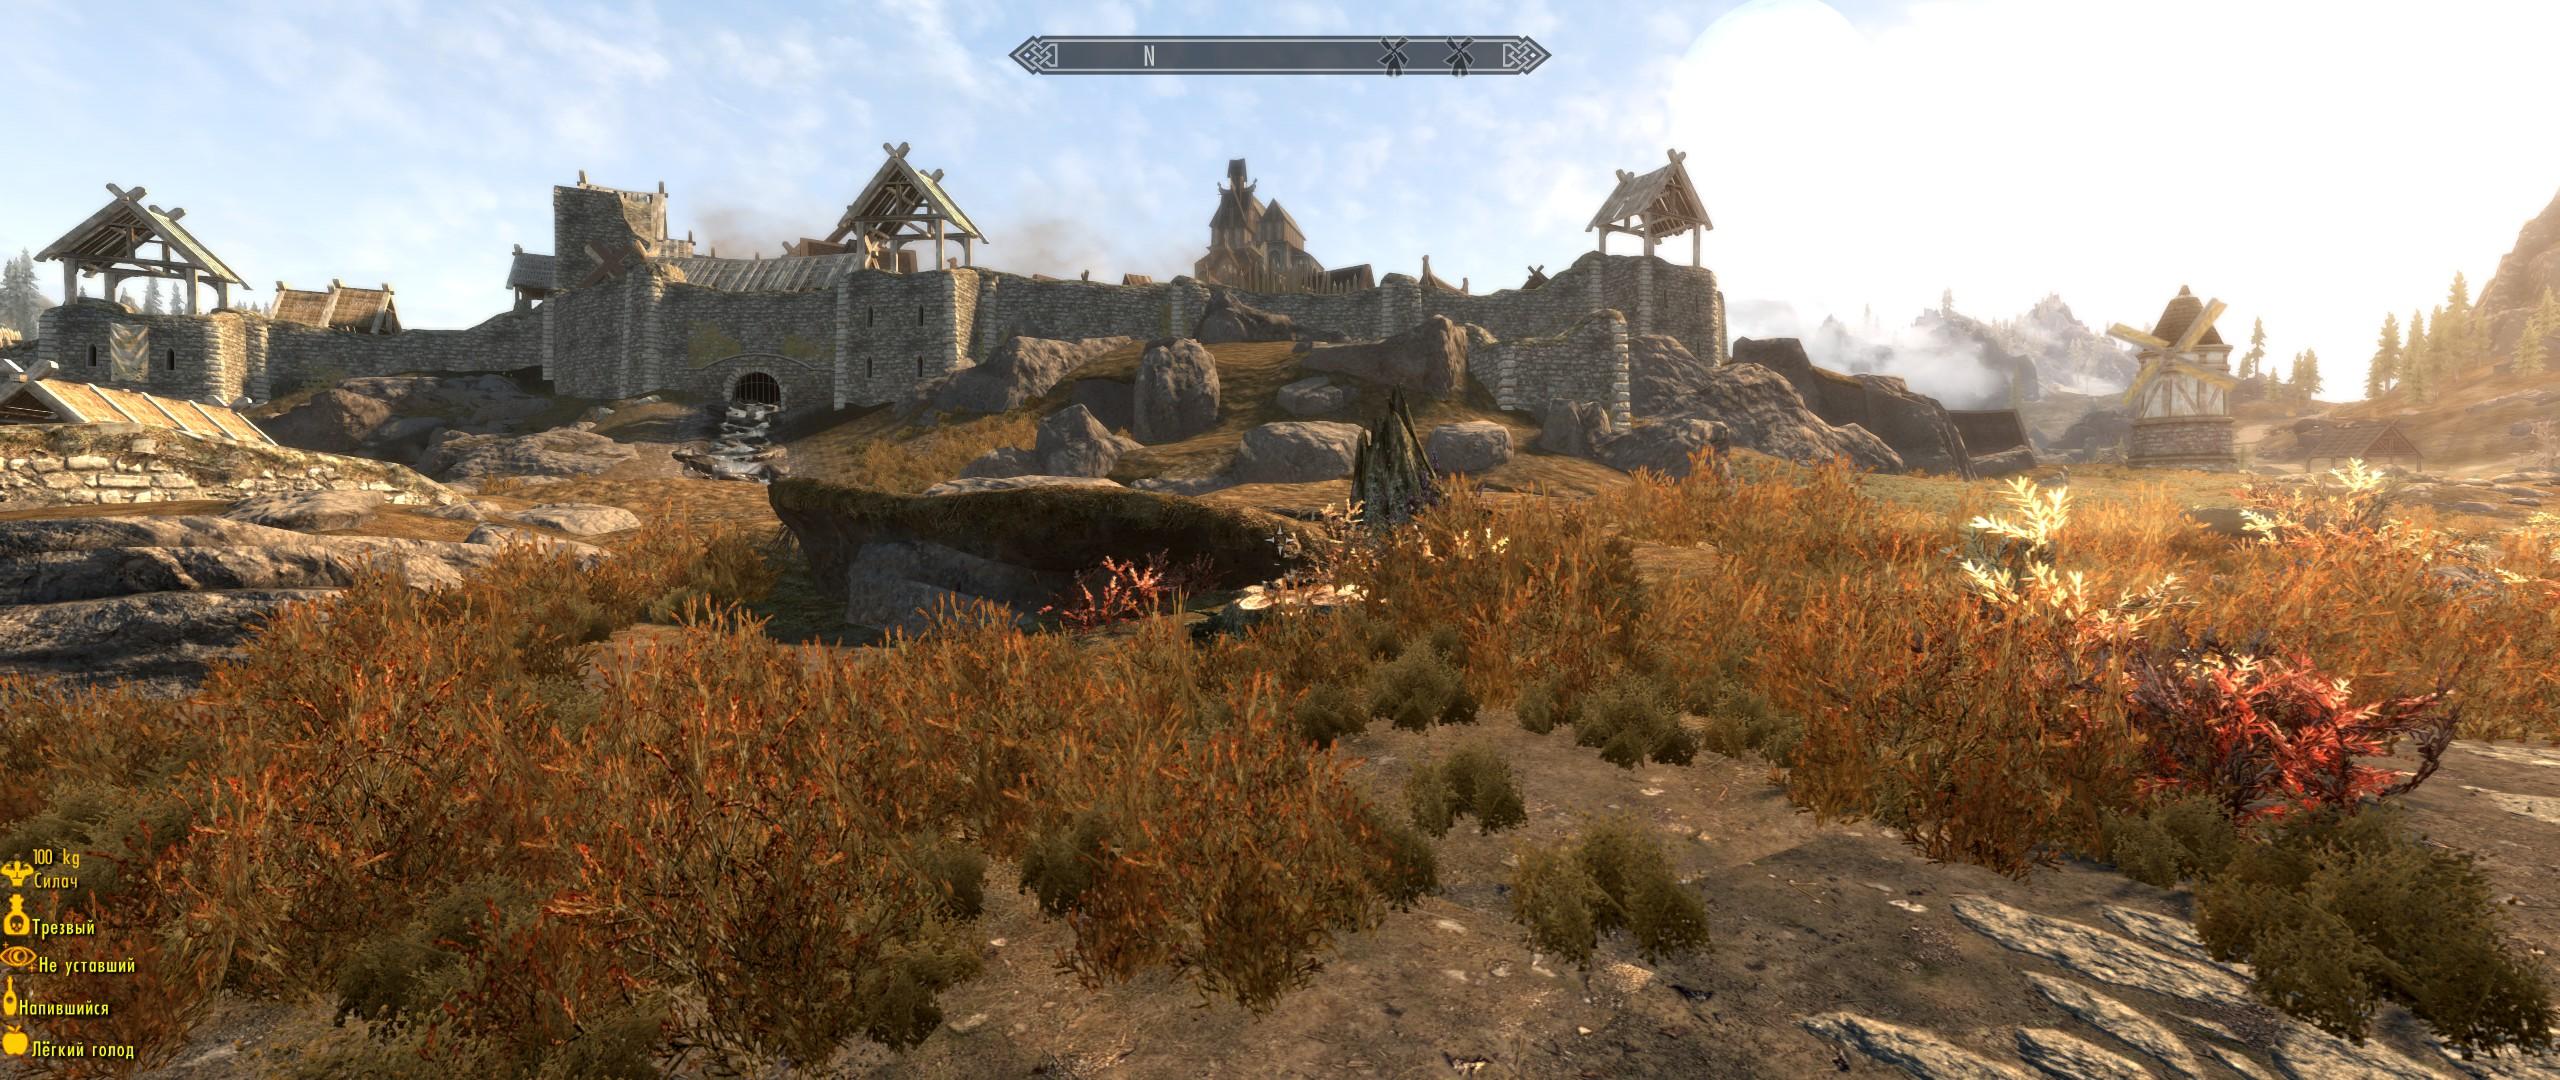 20200521011152_1.jpg - The Elder Scrolls 5: Skyrim